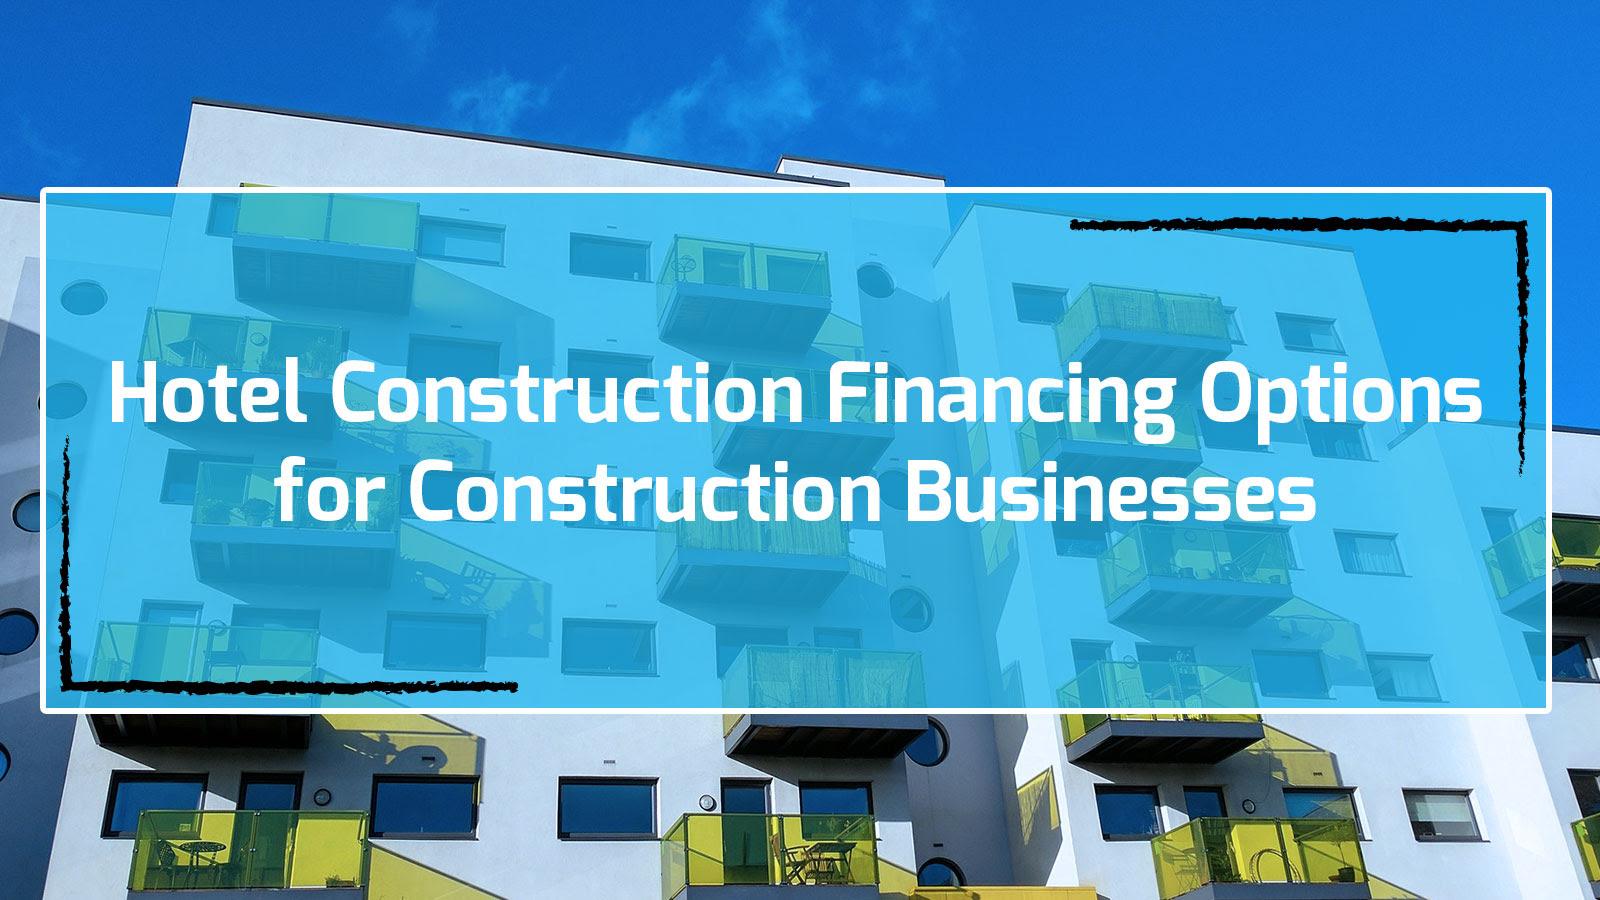 #hotelfinancing, #hotelfinancingloans, #hotelpurchaseloan, #hotelconstructionloan, #hotelrenovationloan